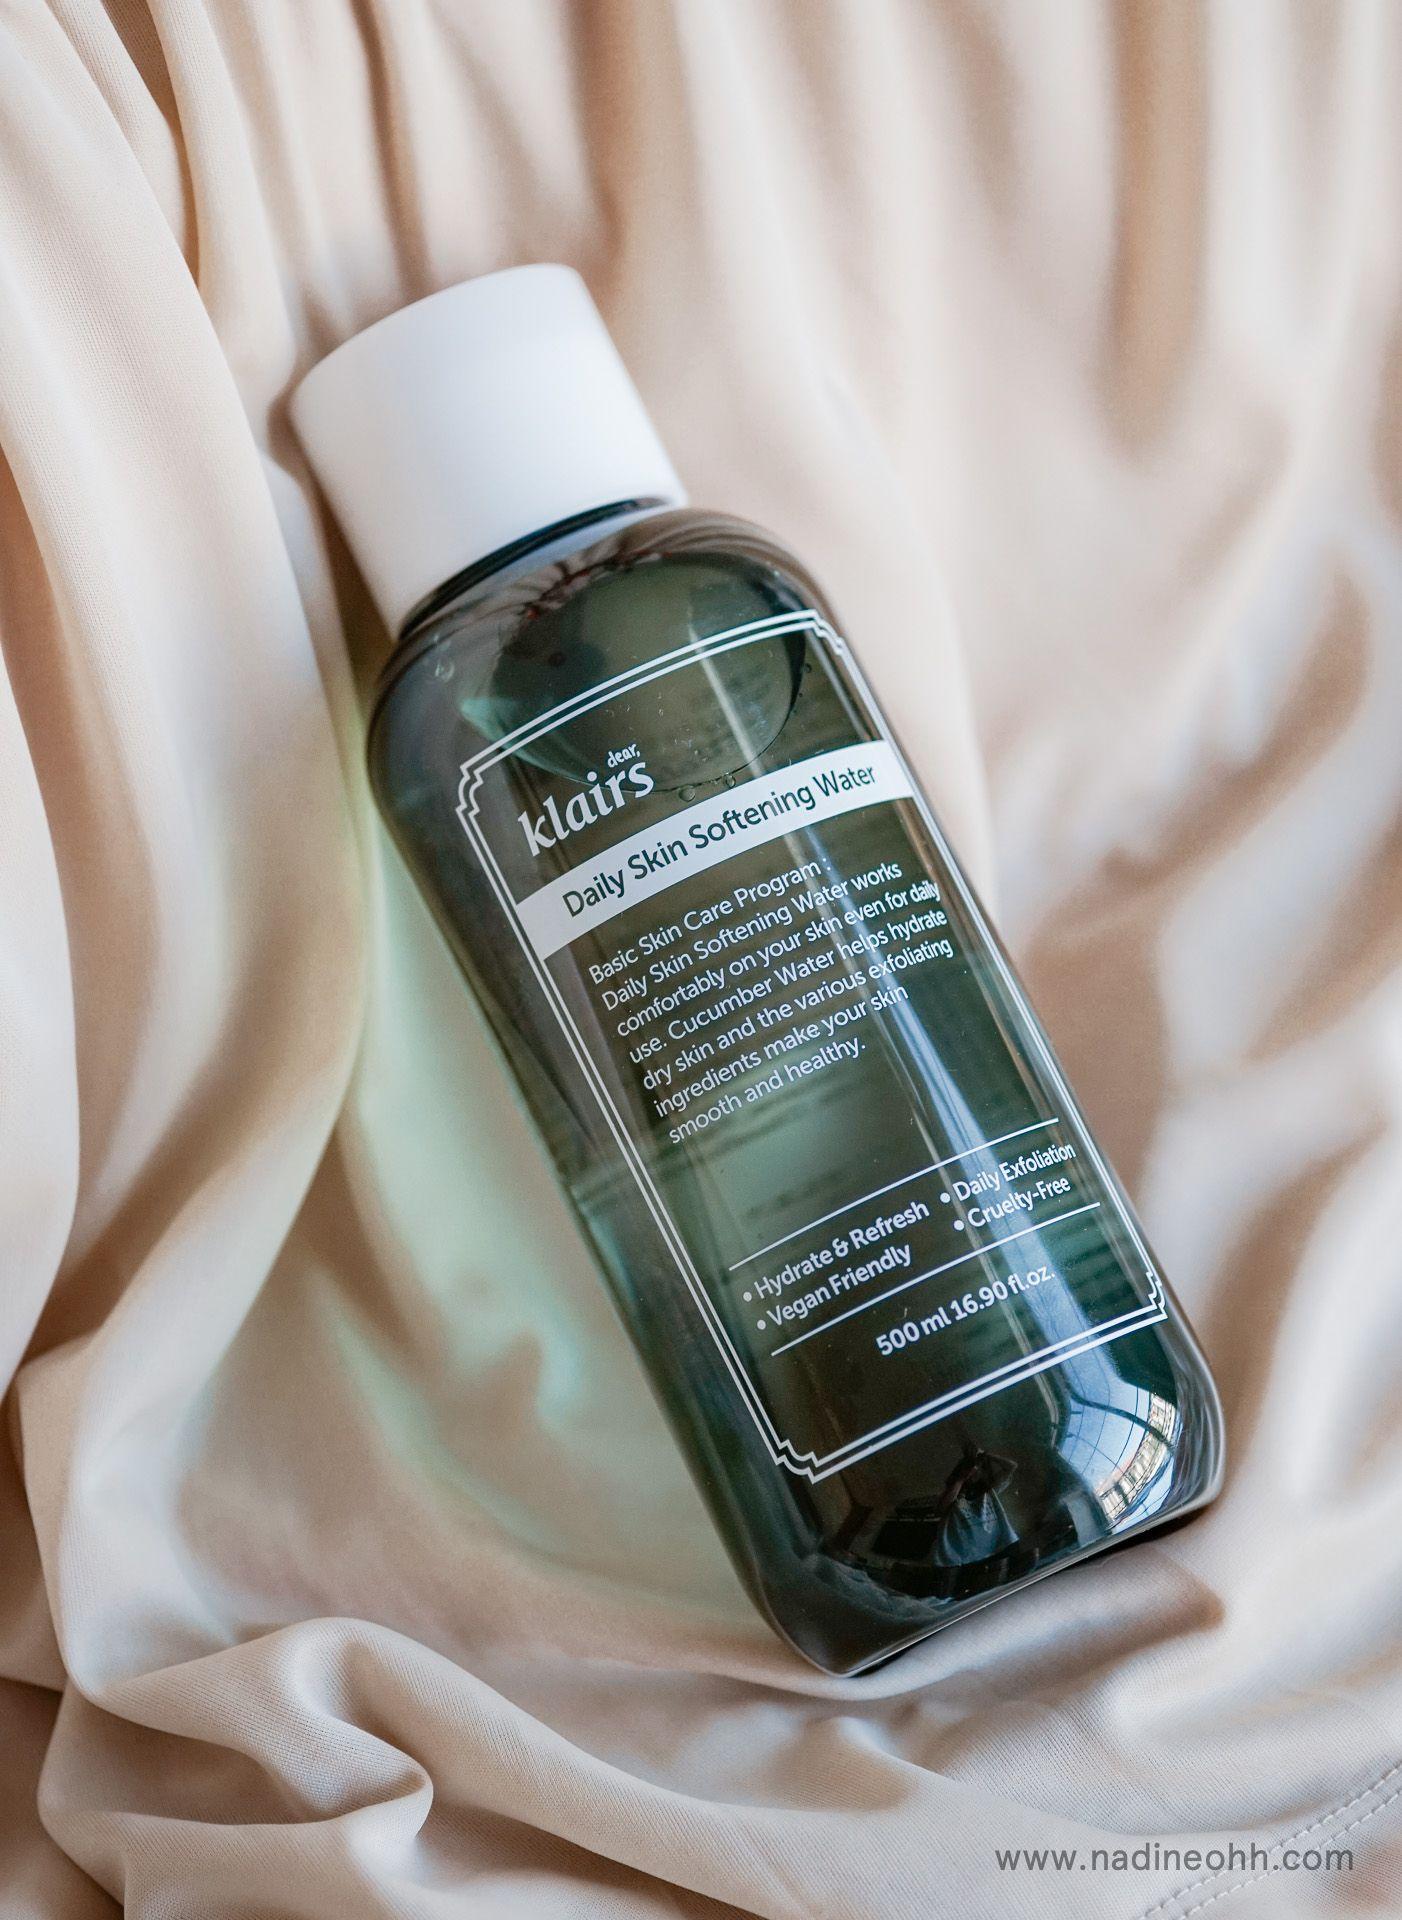 Dear Klairs Daily Skin Softening Water Hydrate Dry Skin Body Care Body Skin Care